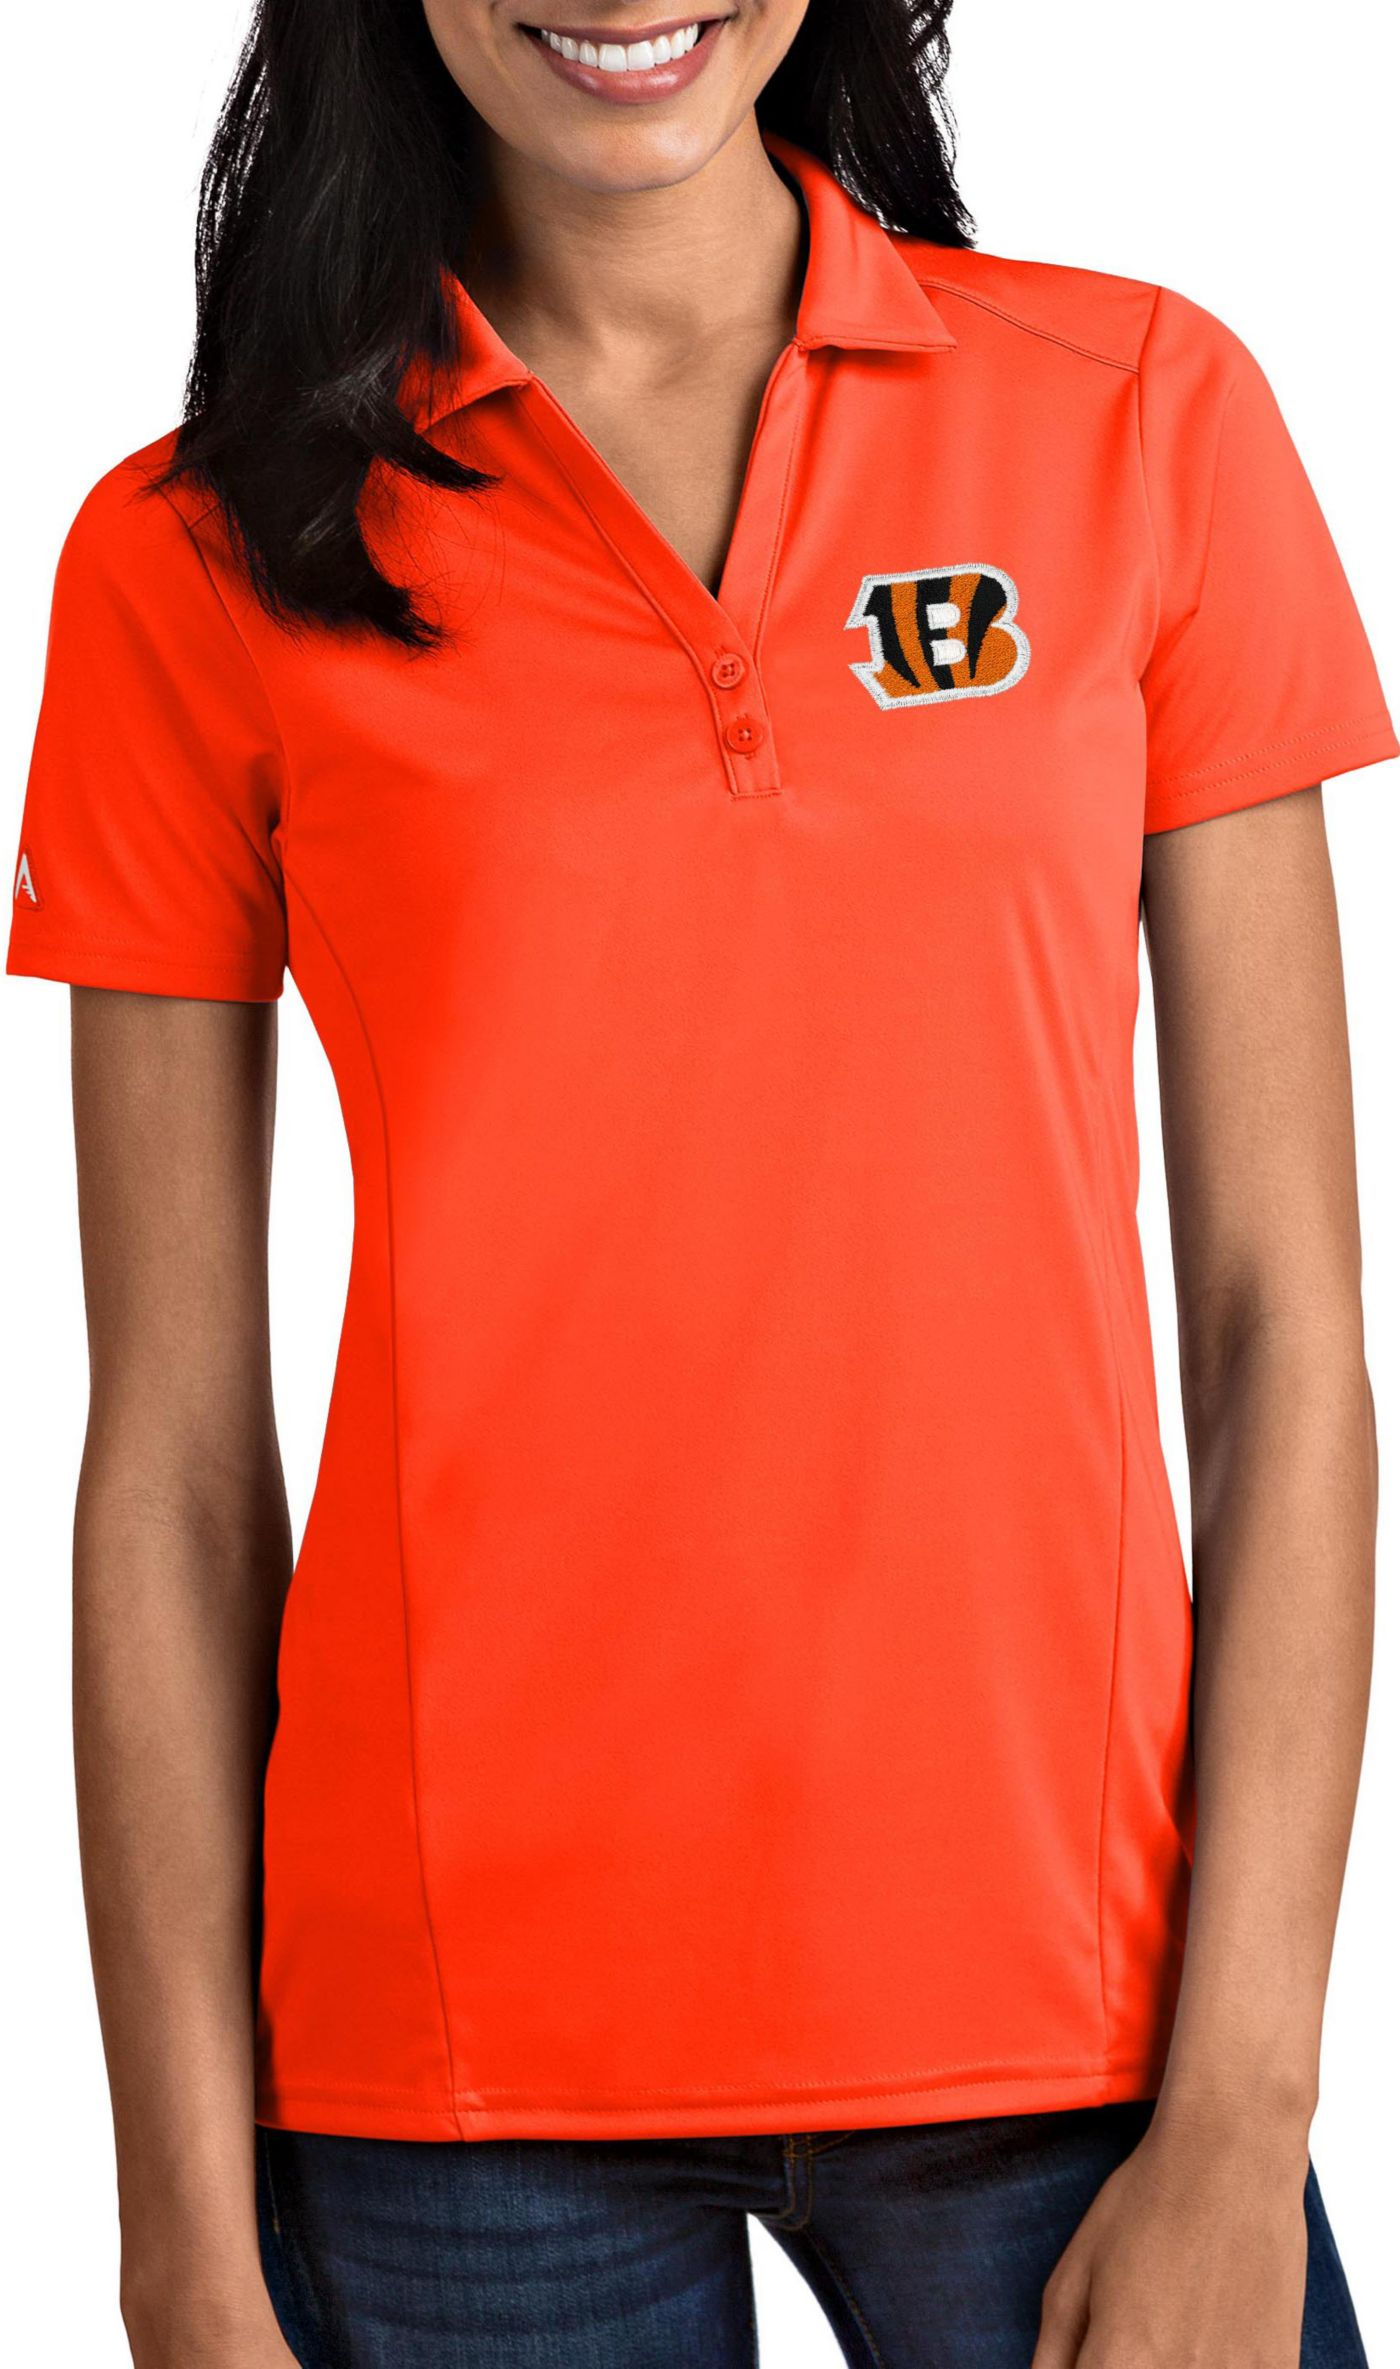 Antigua Women's Cincinnati Bengals Tribute Orange Polo